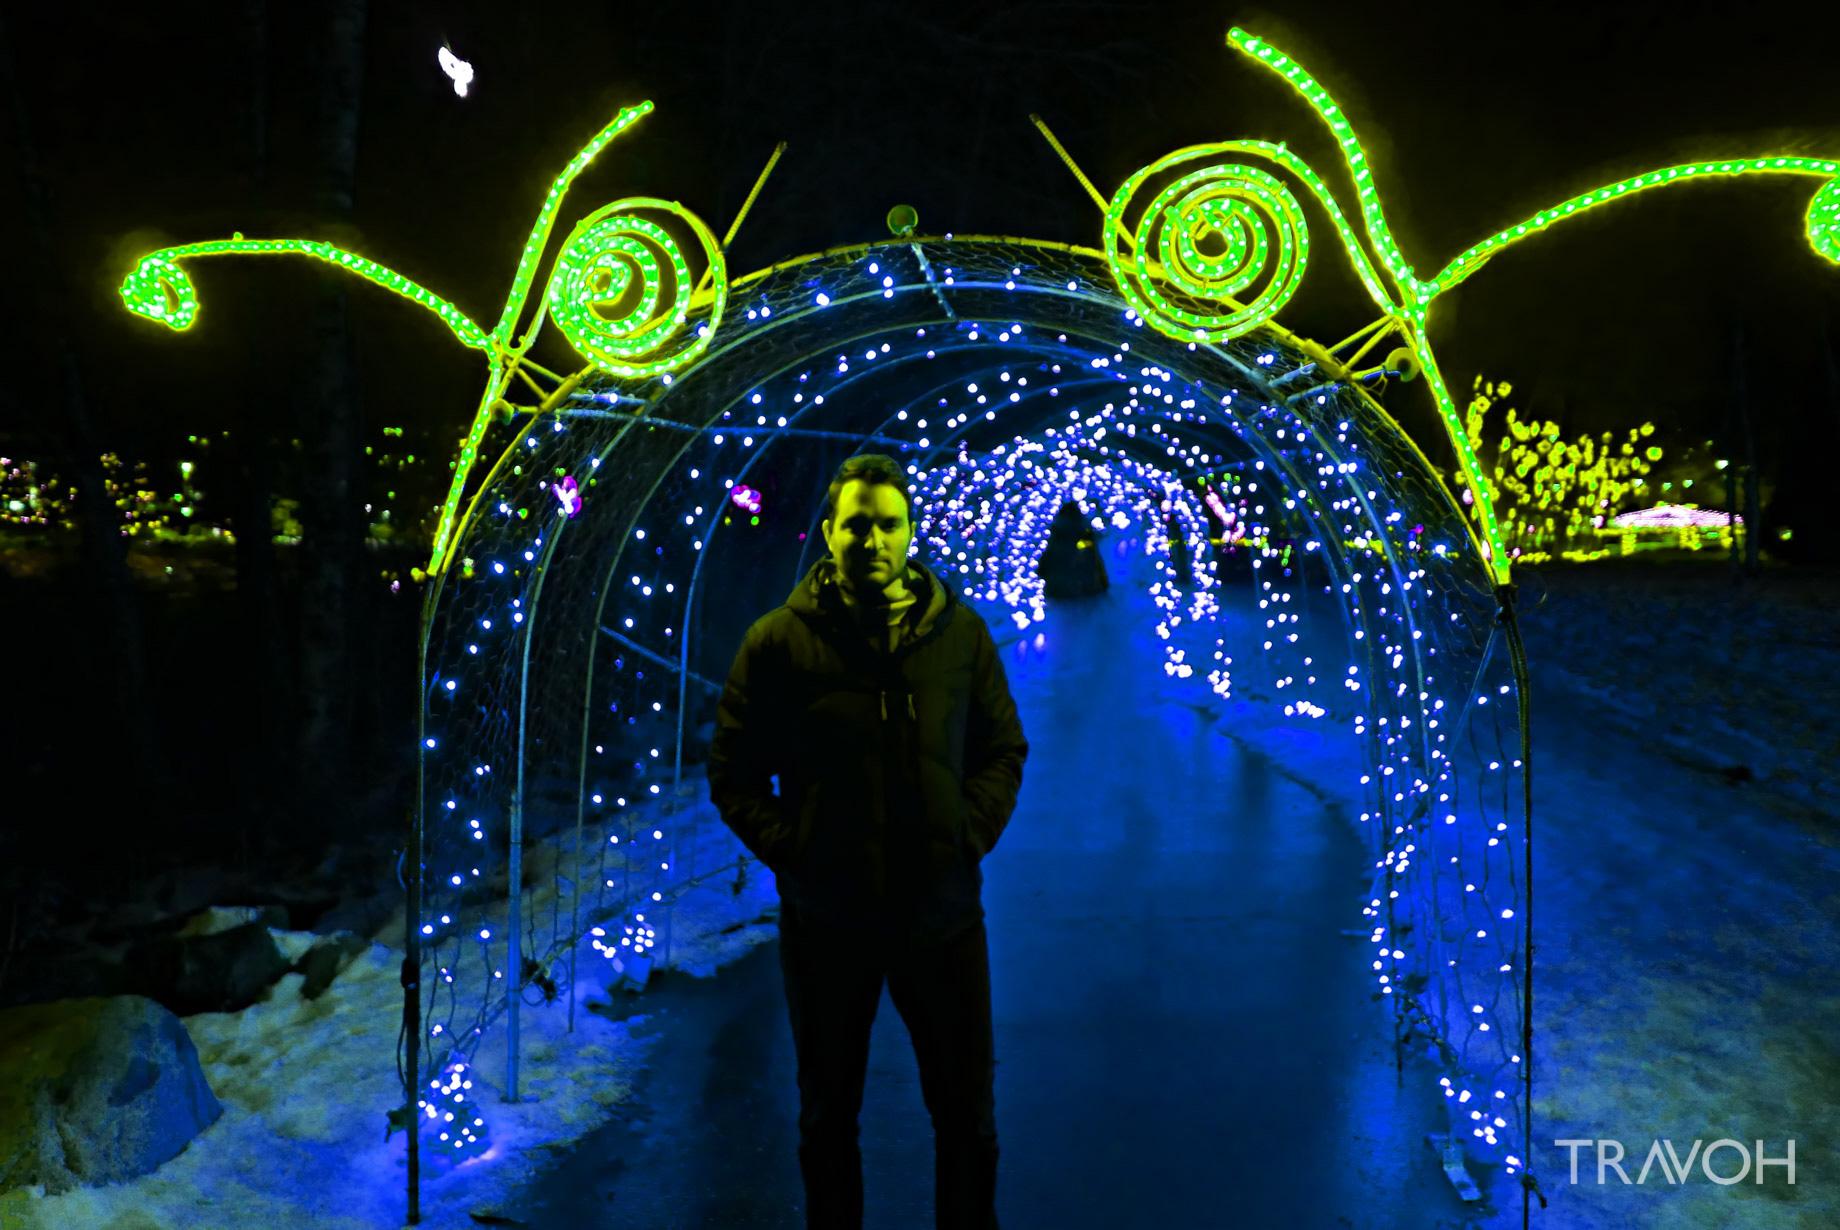 Marcus Anthony - Lafarge Winter Lights Display - Caterpillar - Coquitlam, BC, Canada